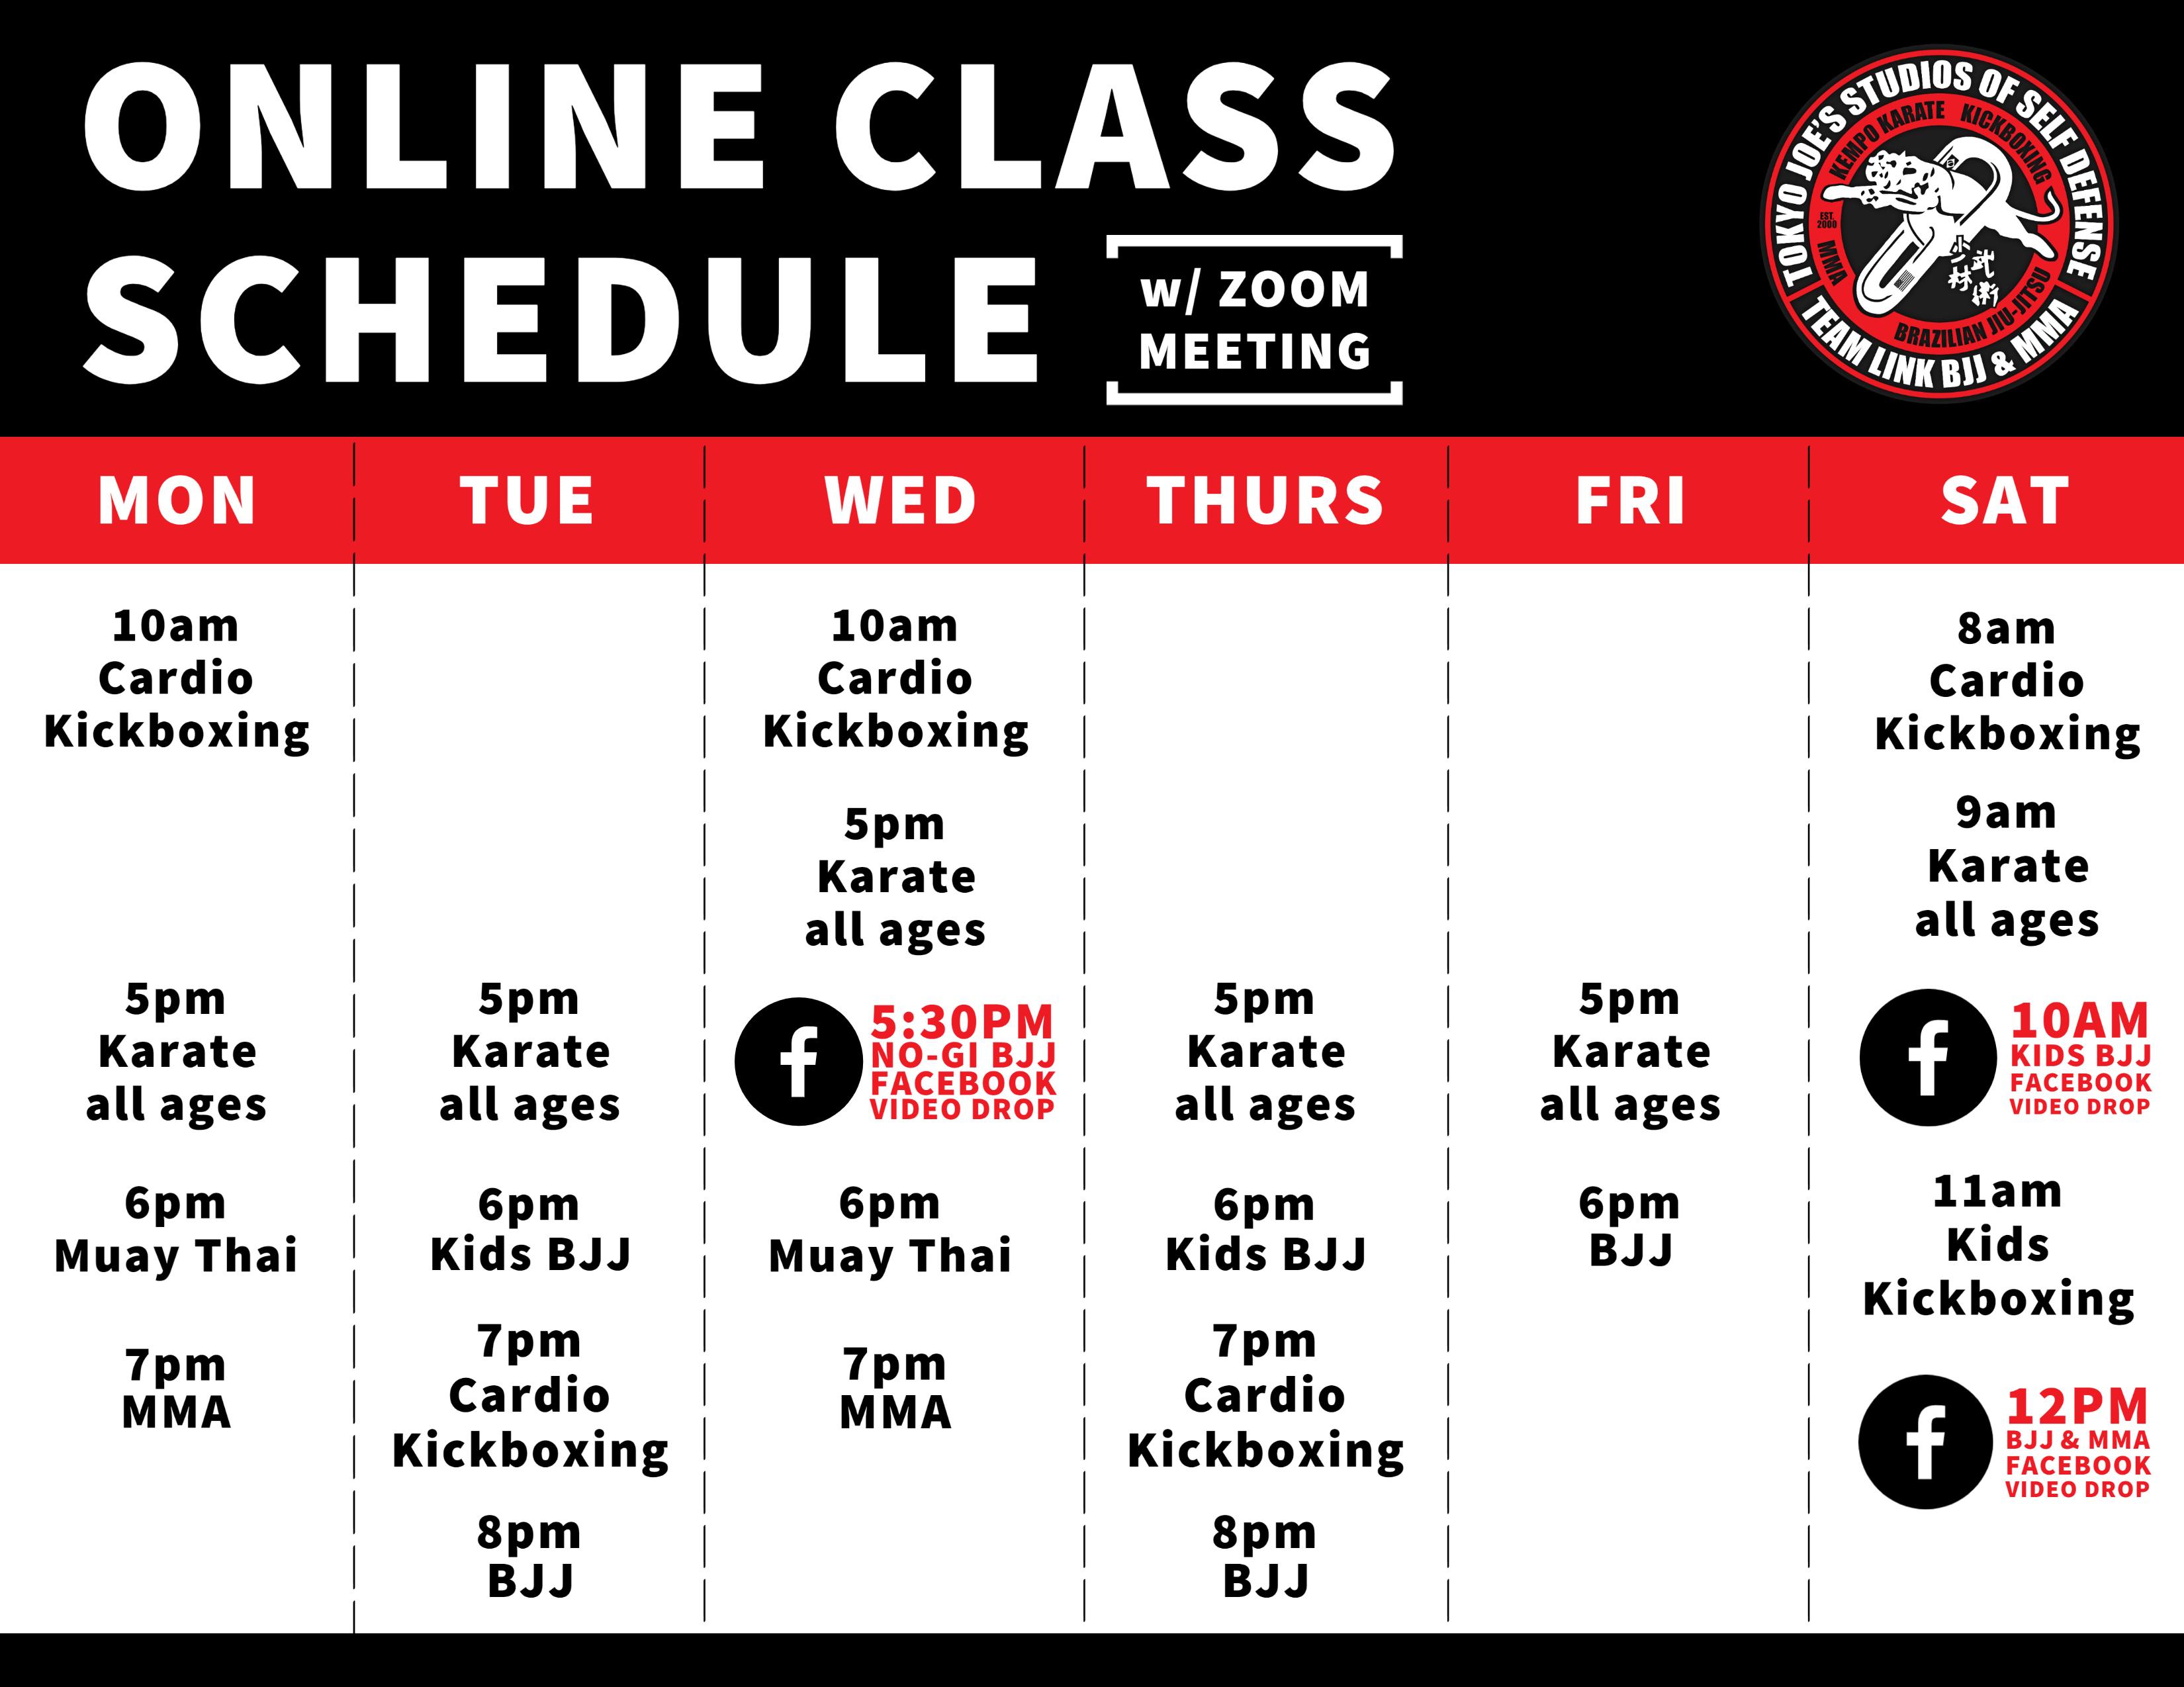 On Line Schedule